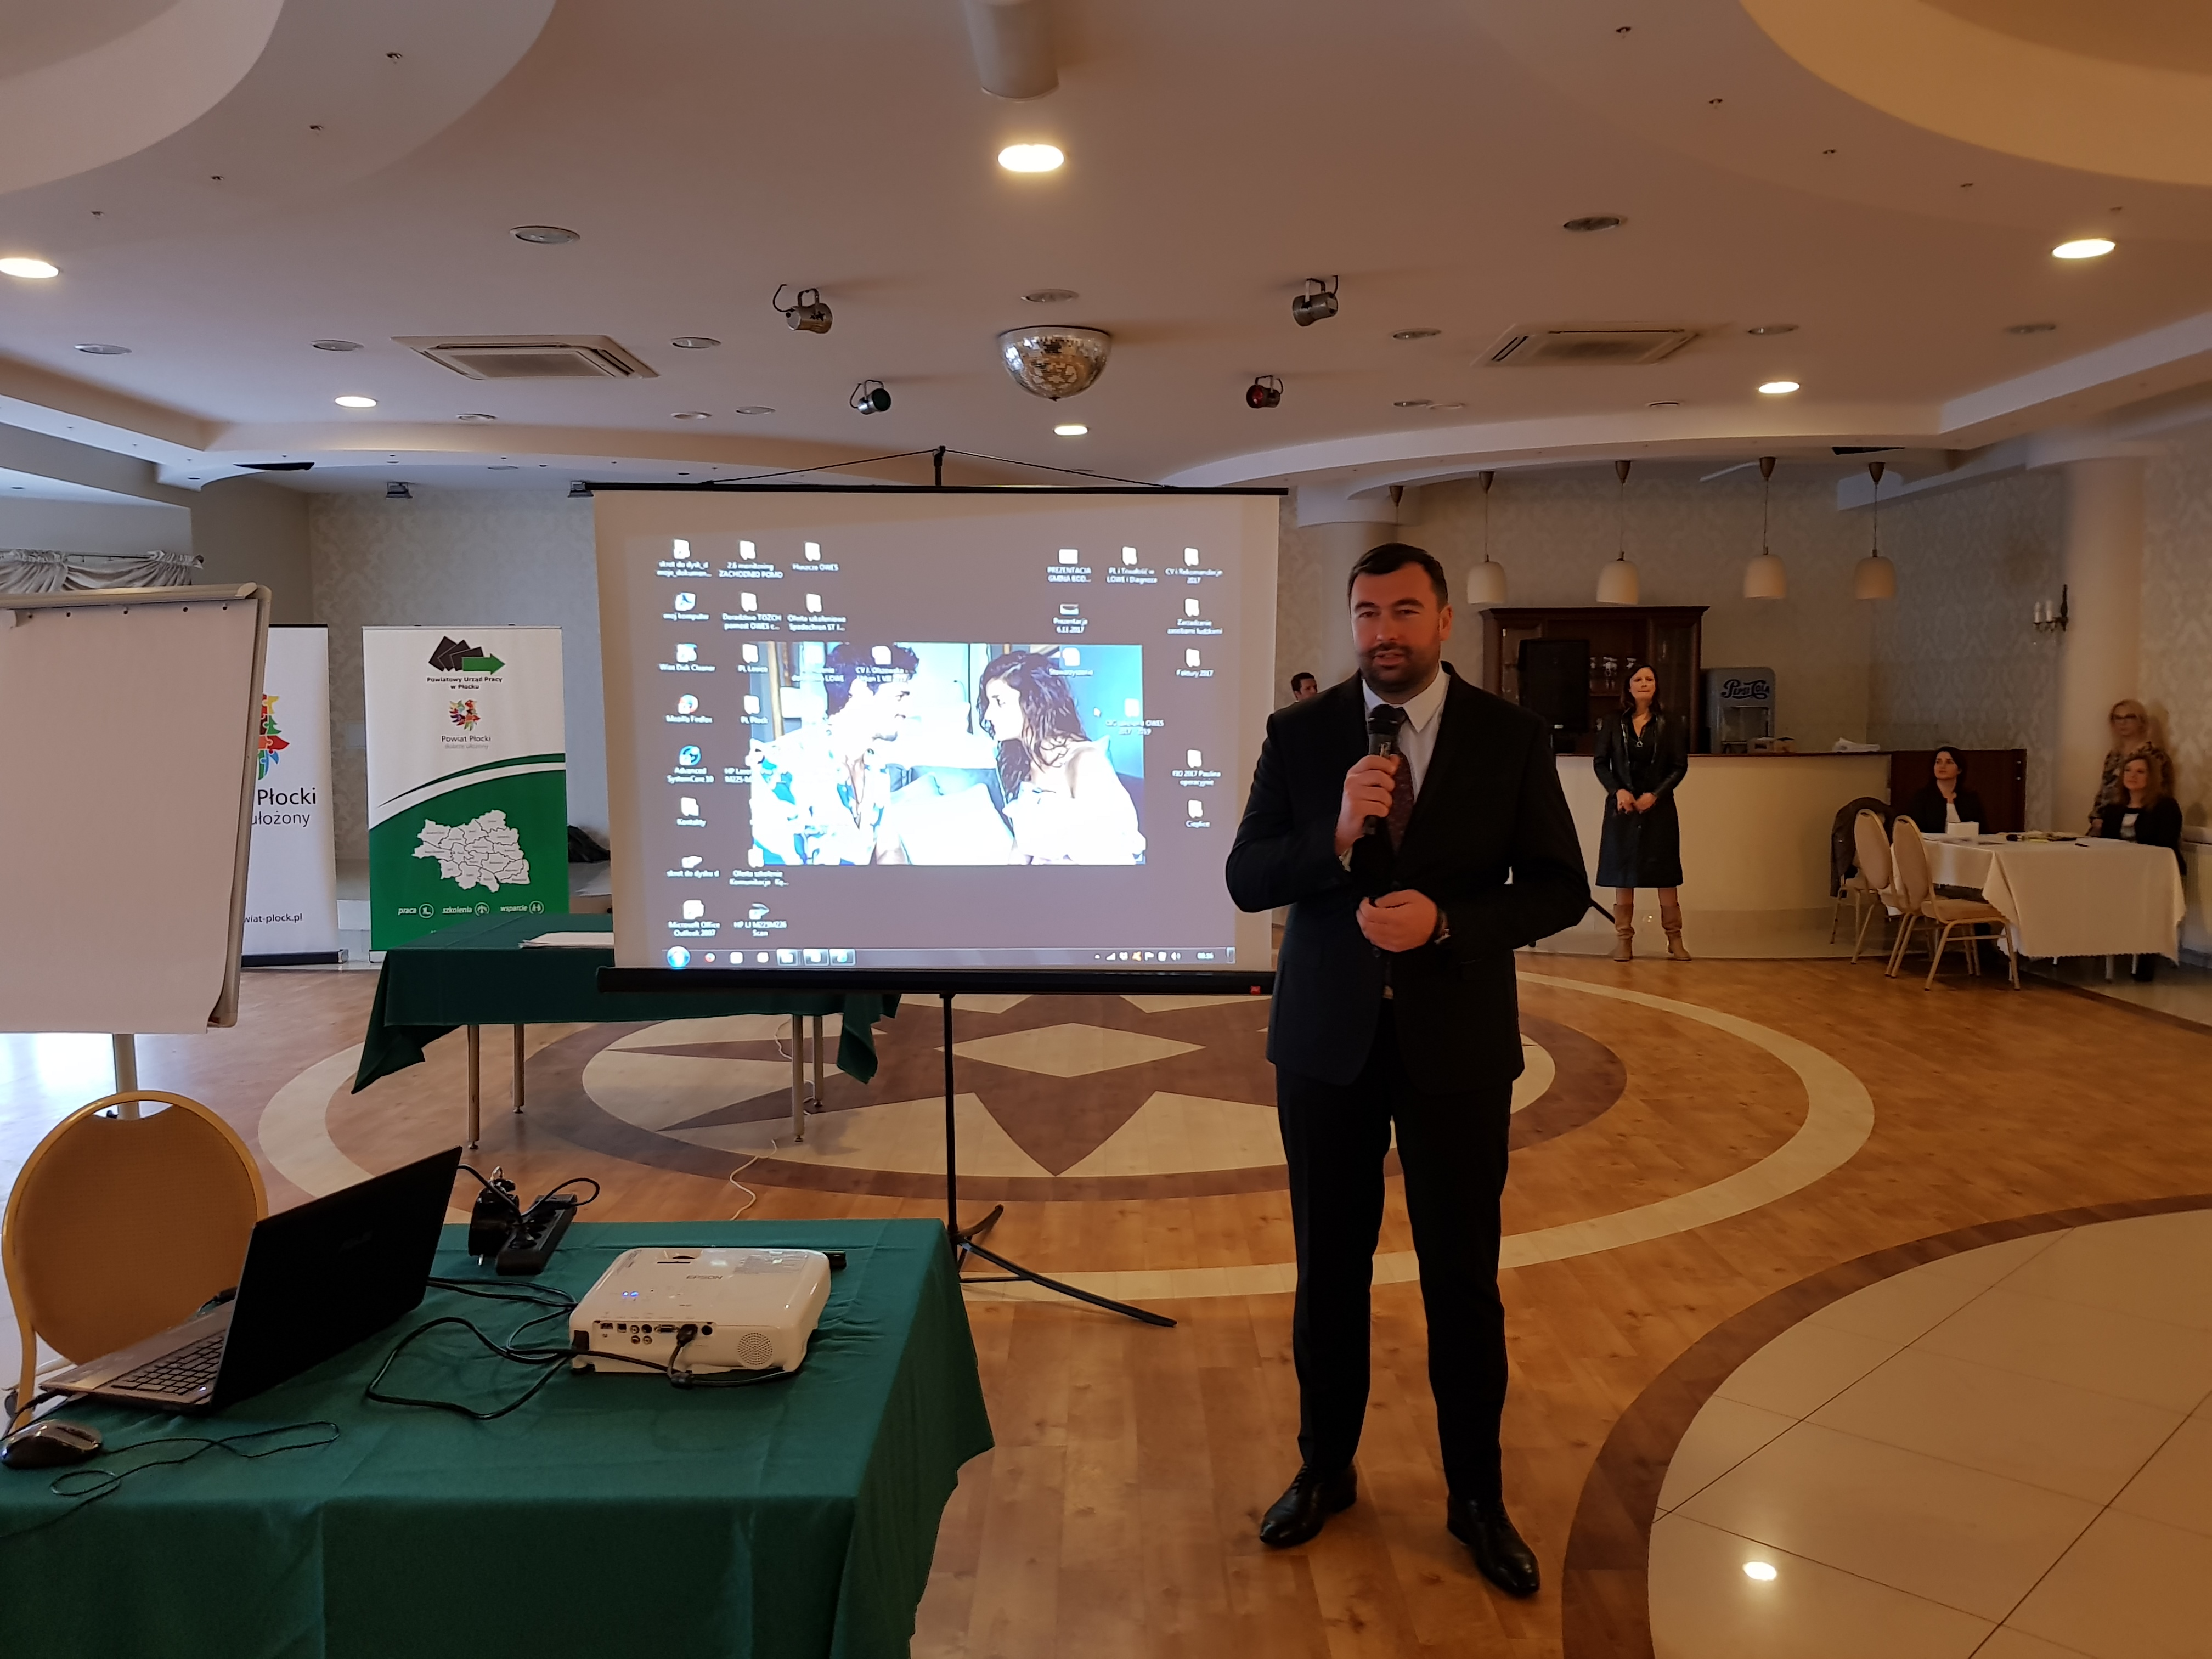 Partnerstwo dla pracy V Konferencja 6.11.2017-1